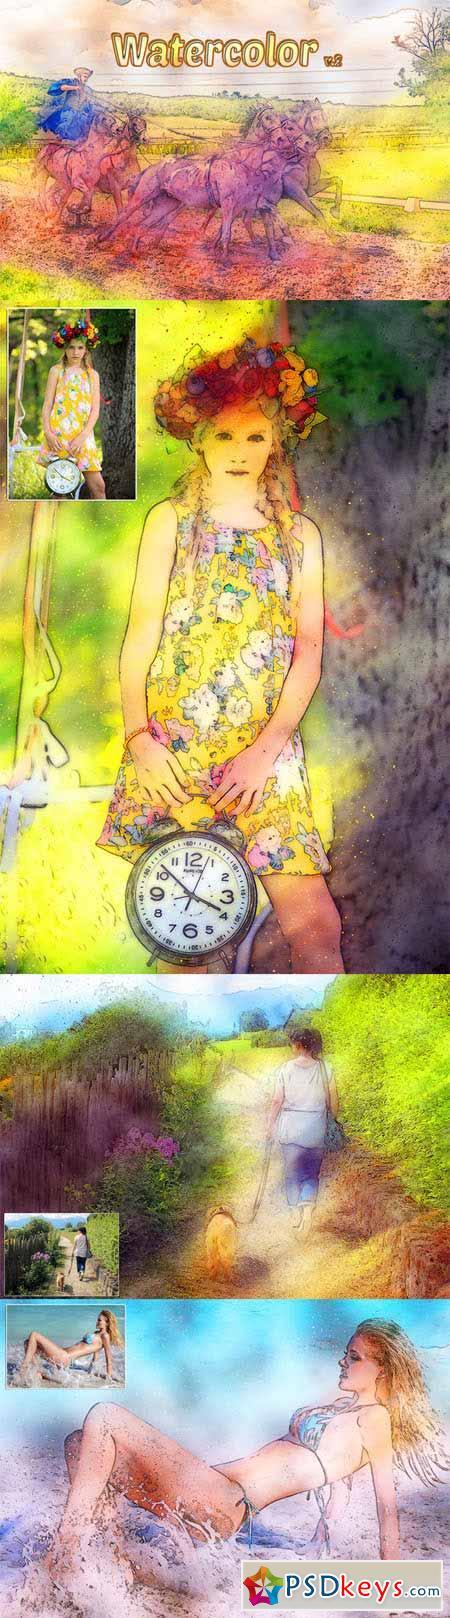 Watercolor v.2 372169